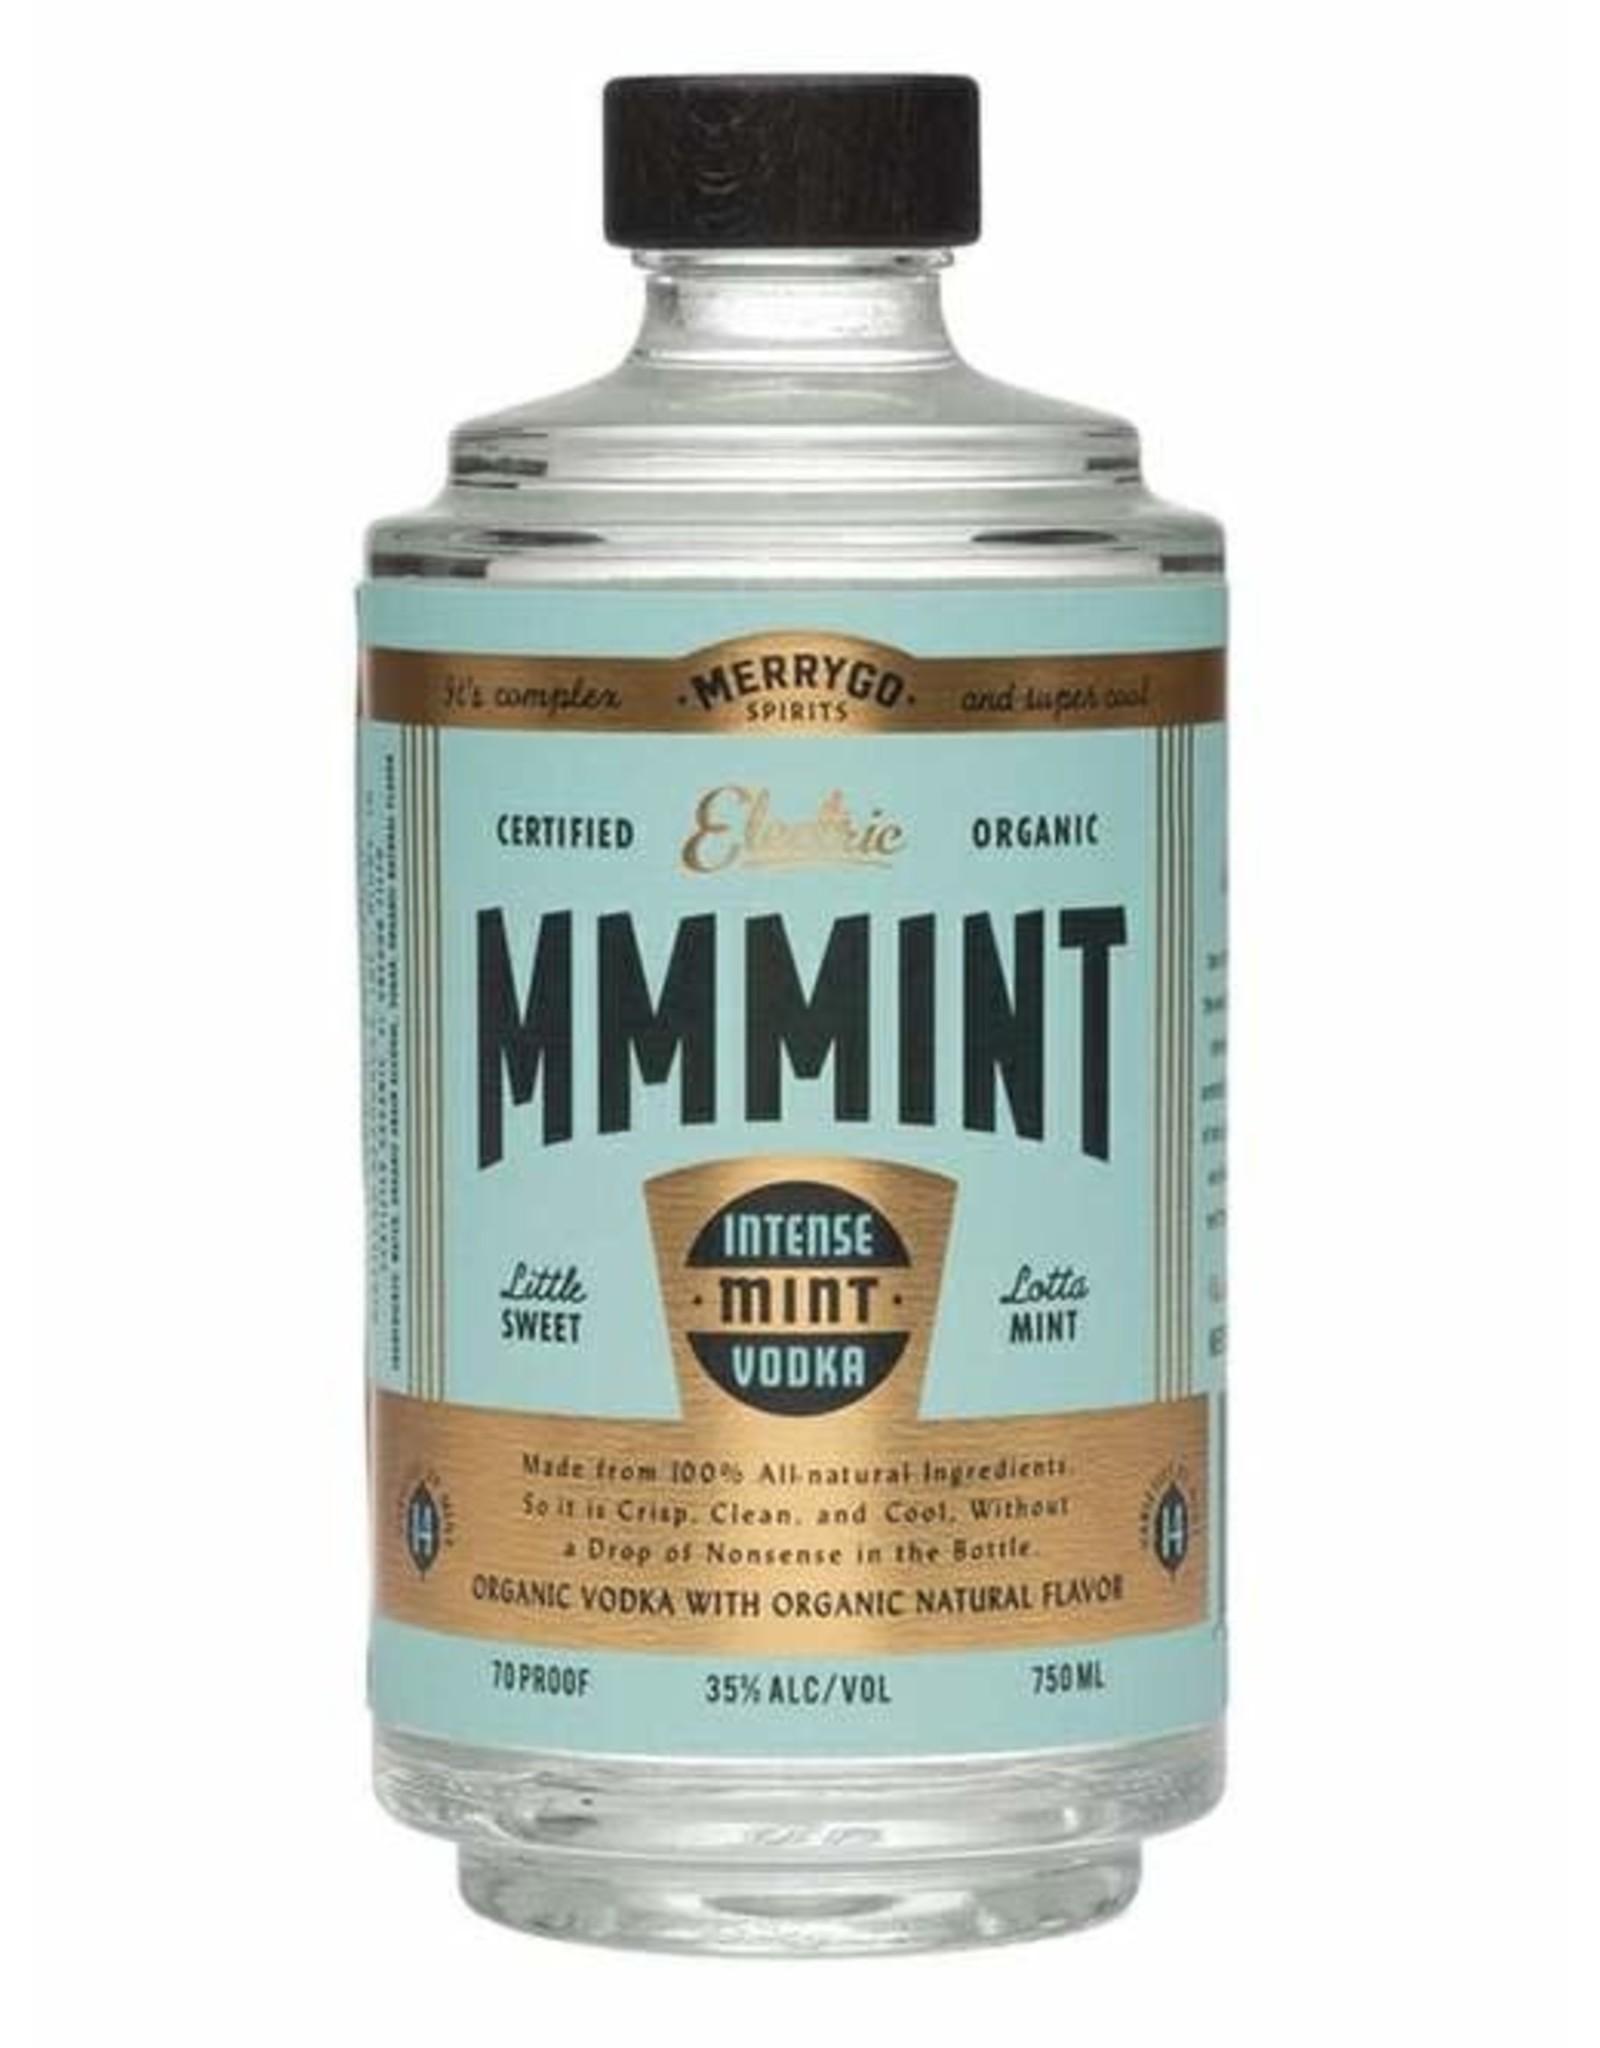 USA MerryGo Spirits MMMint Organic Vodka